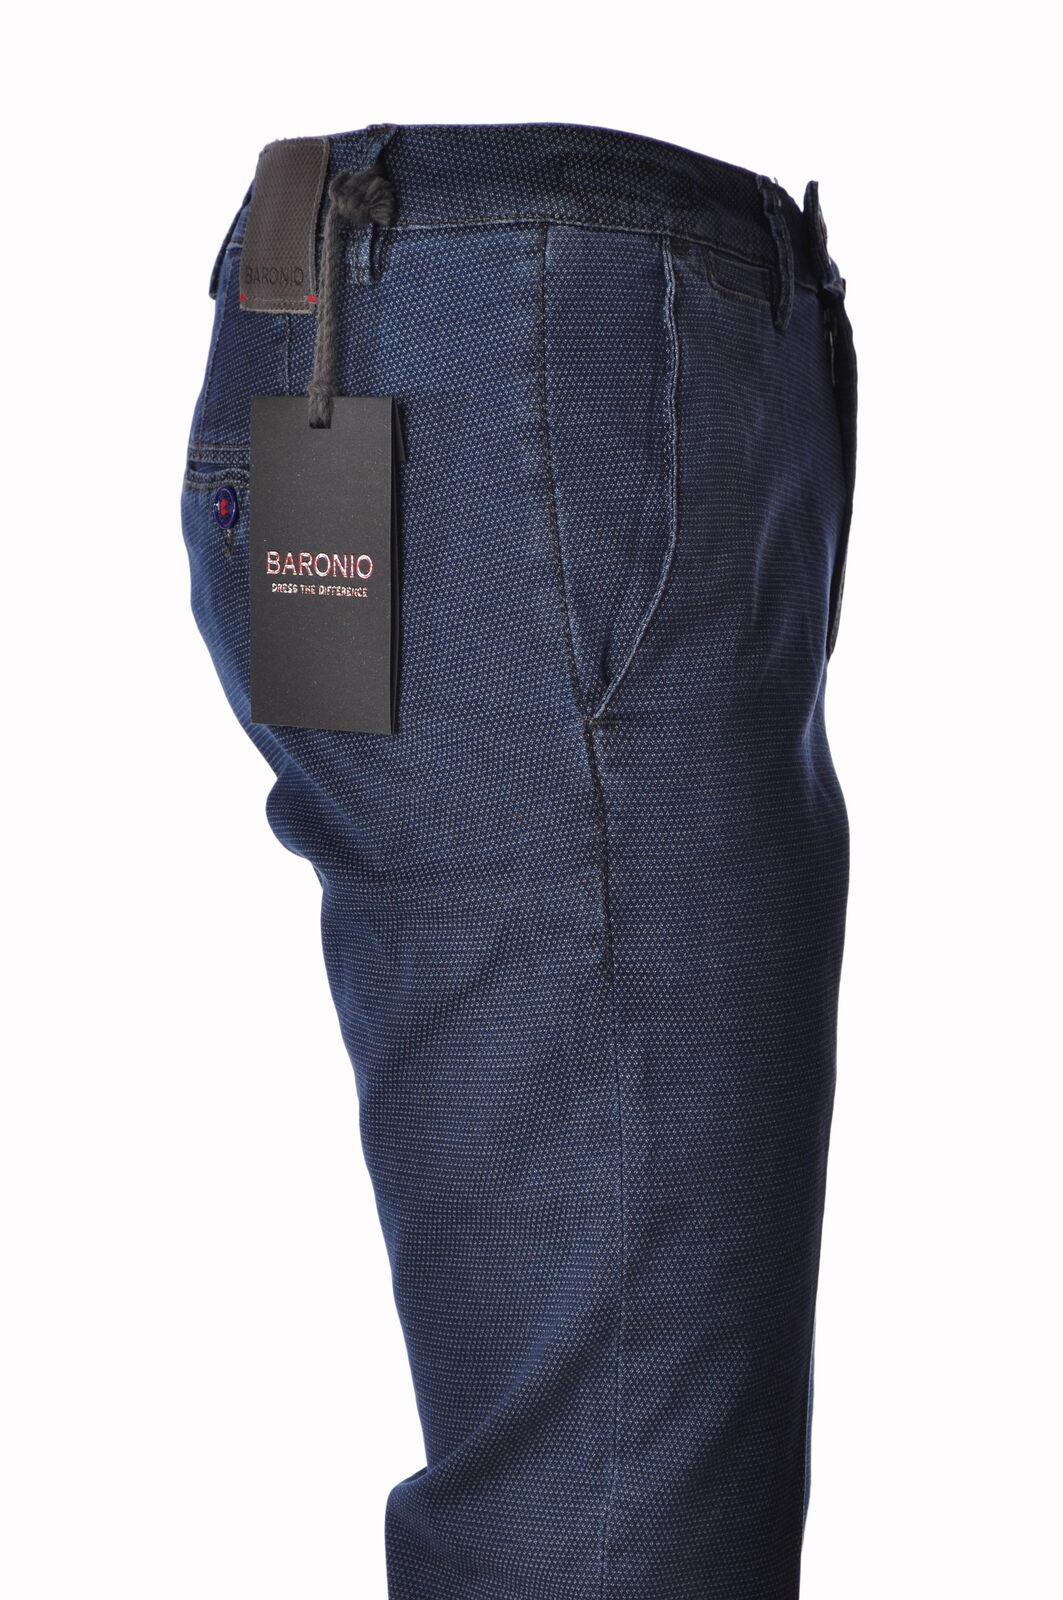 Baronio - Pants-Pants - Man - bluee - 3226006C195729